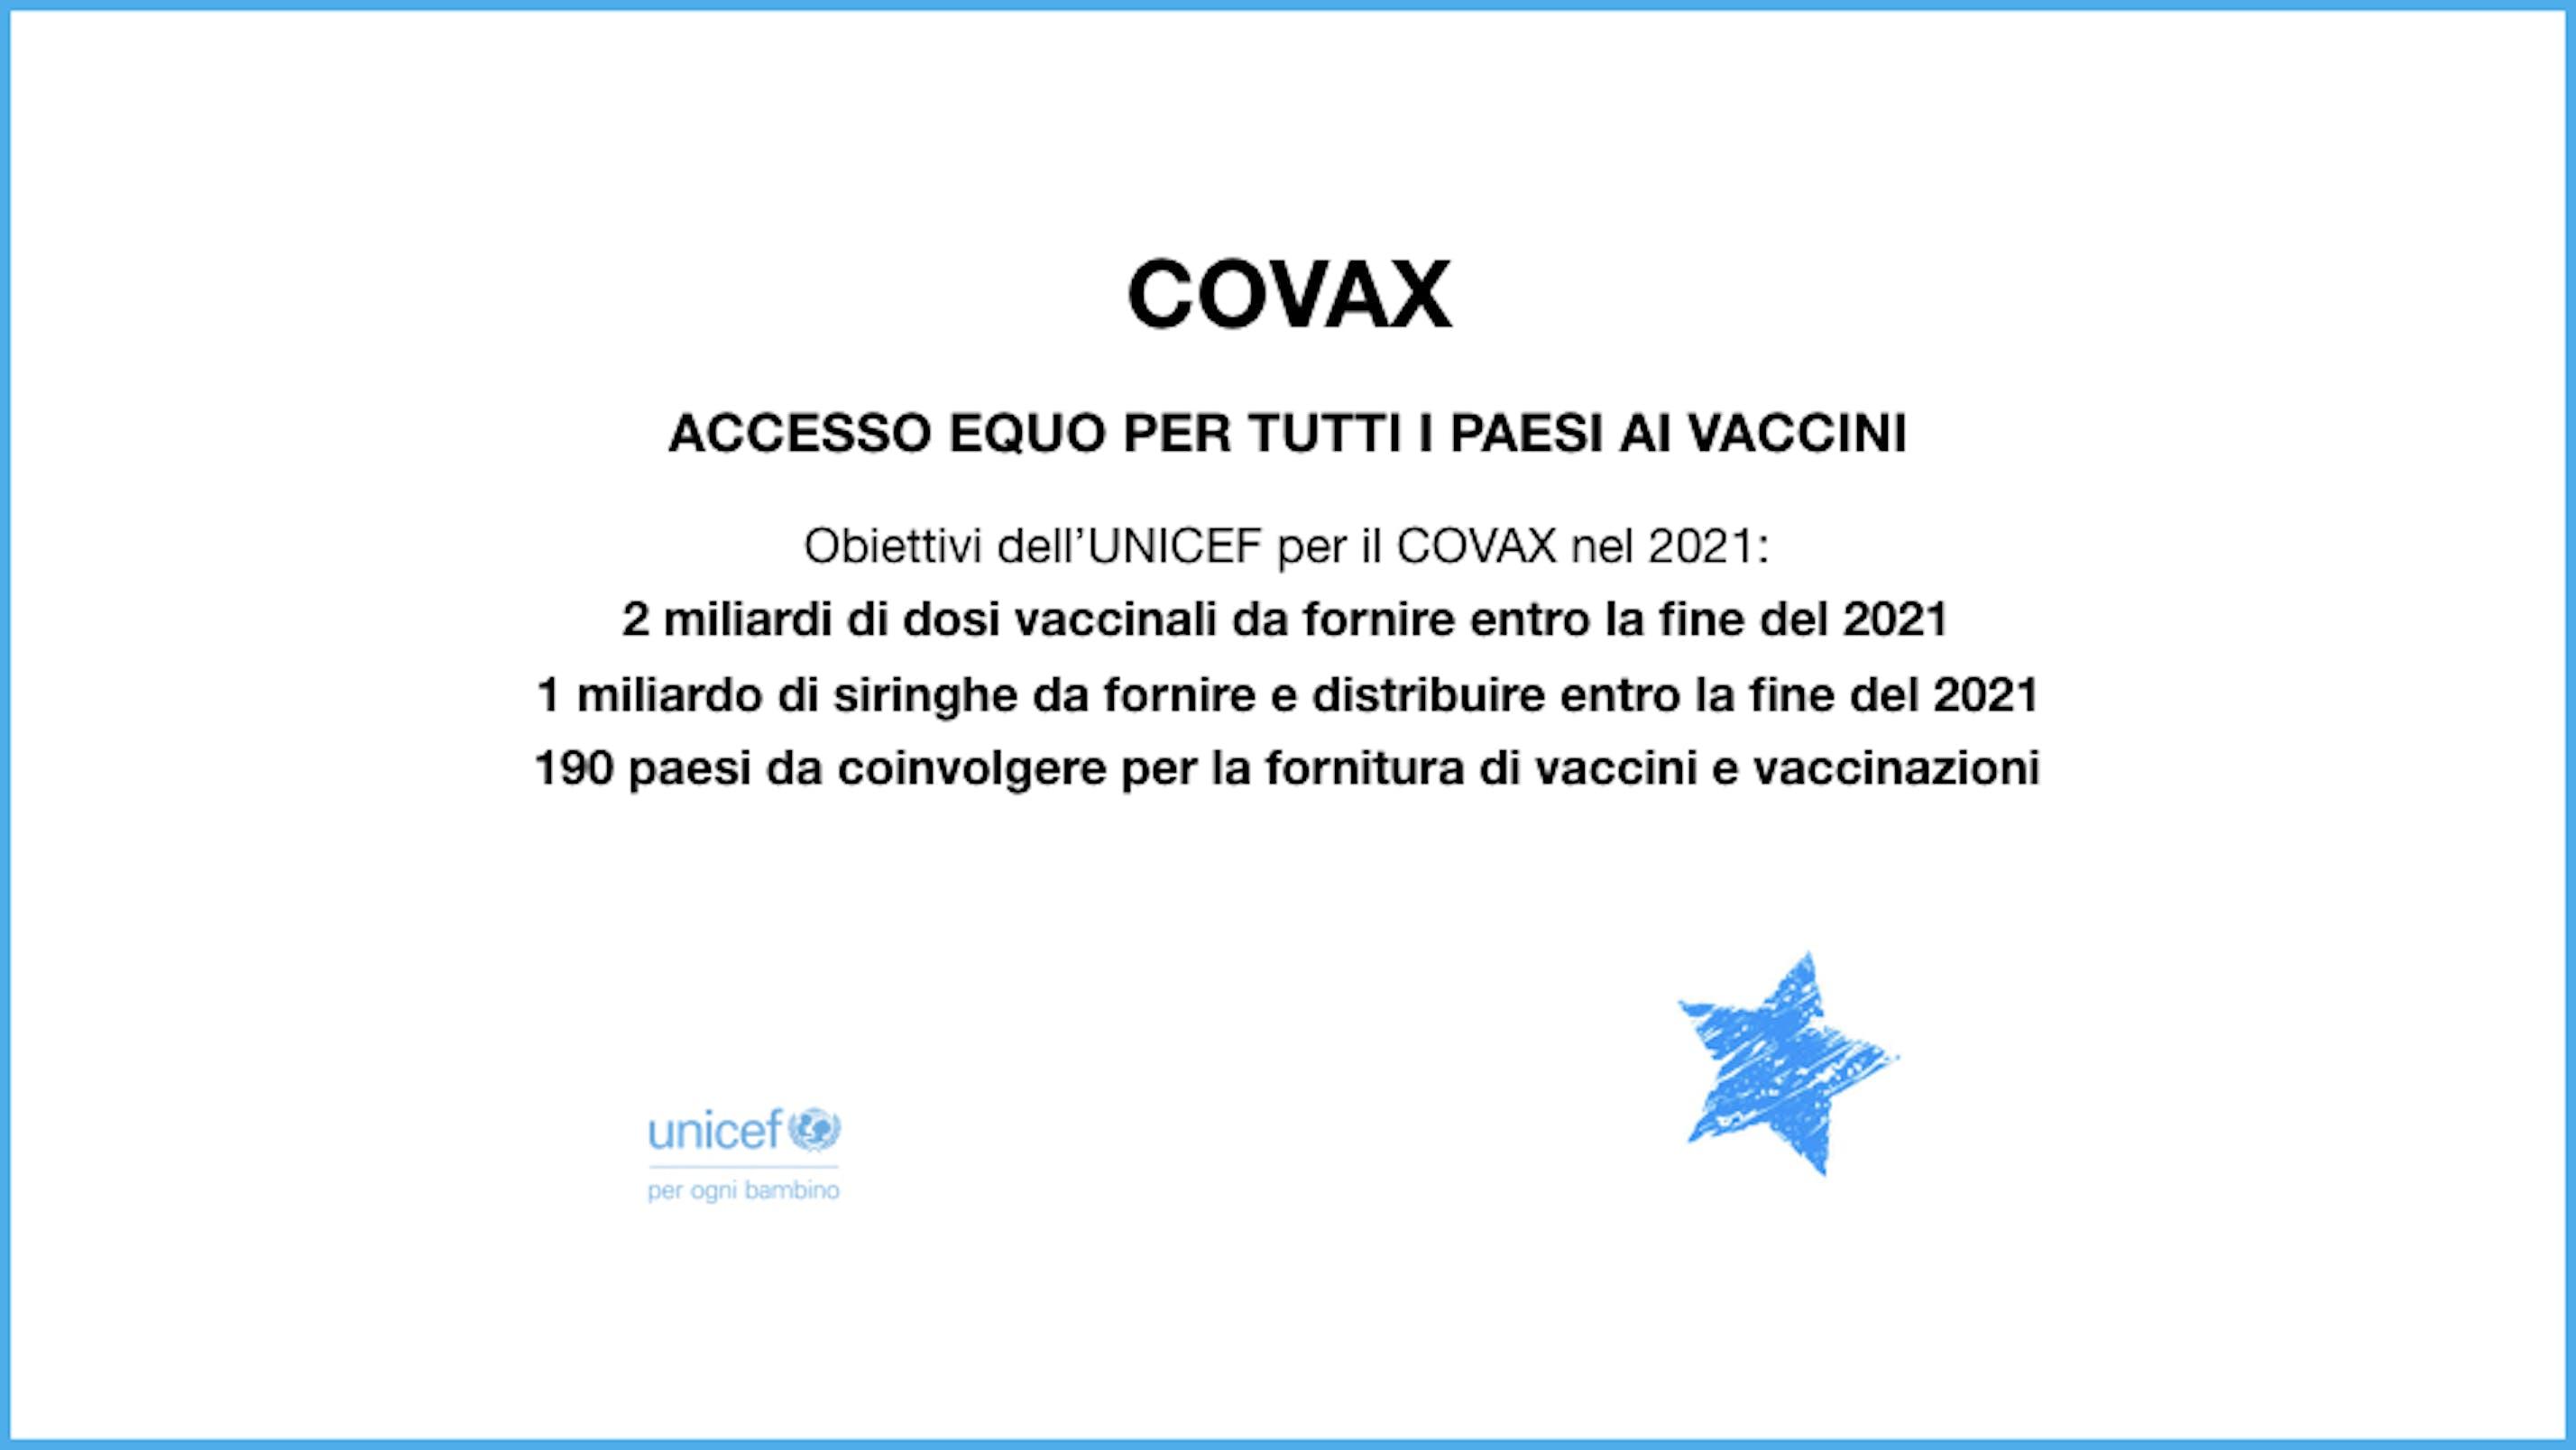 Covax 4